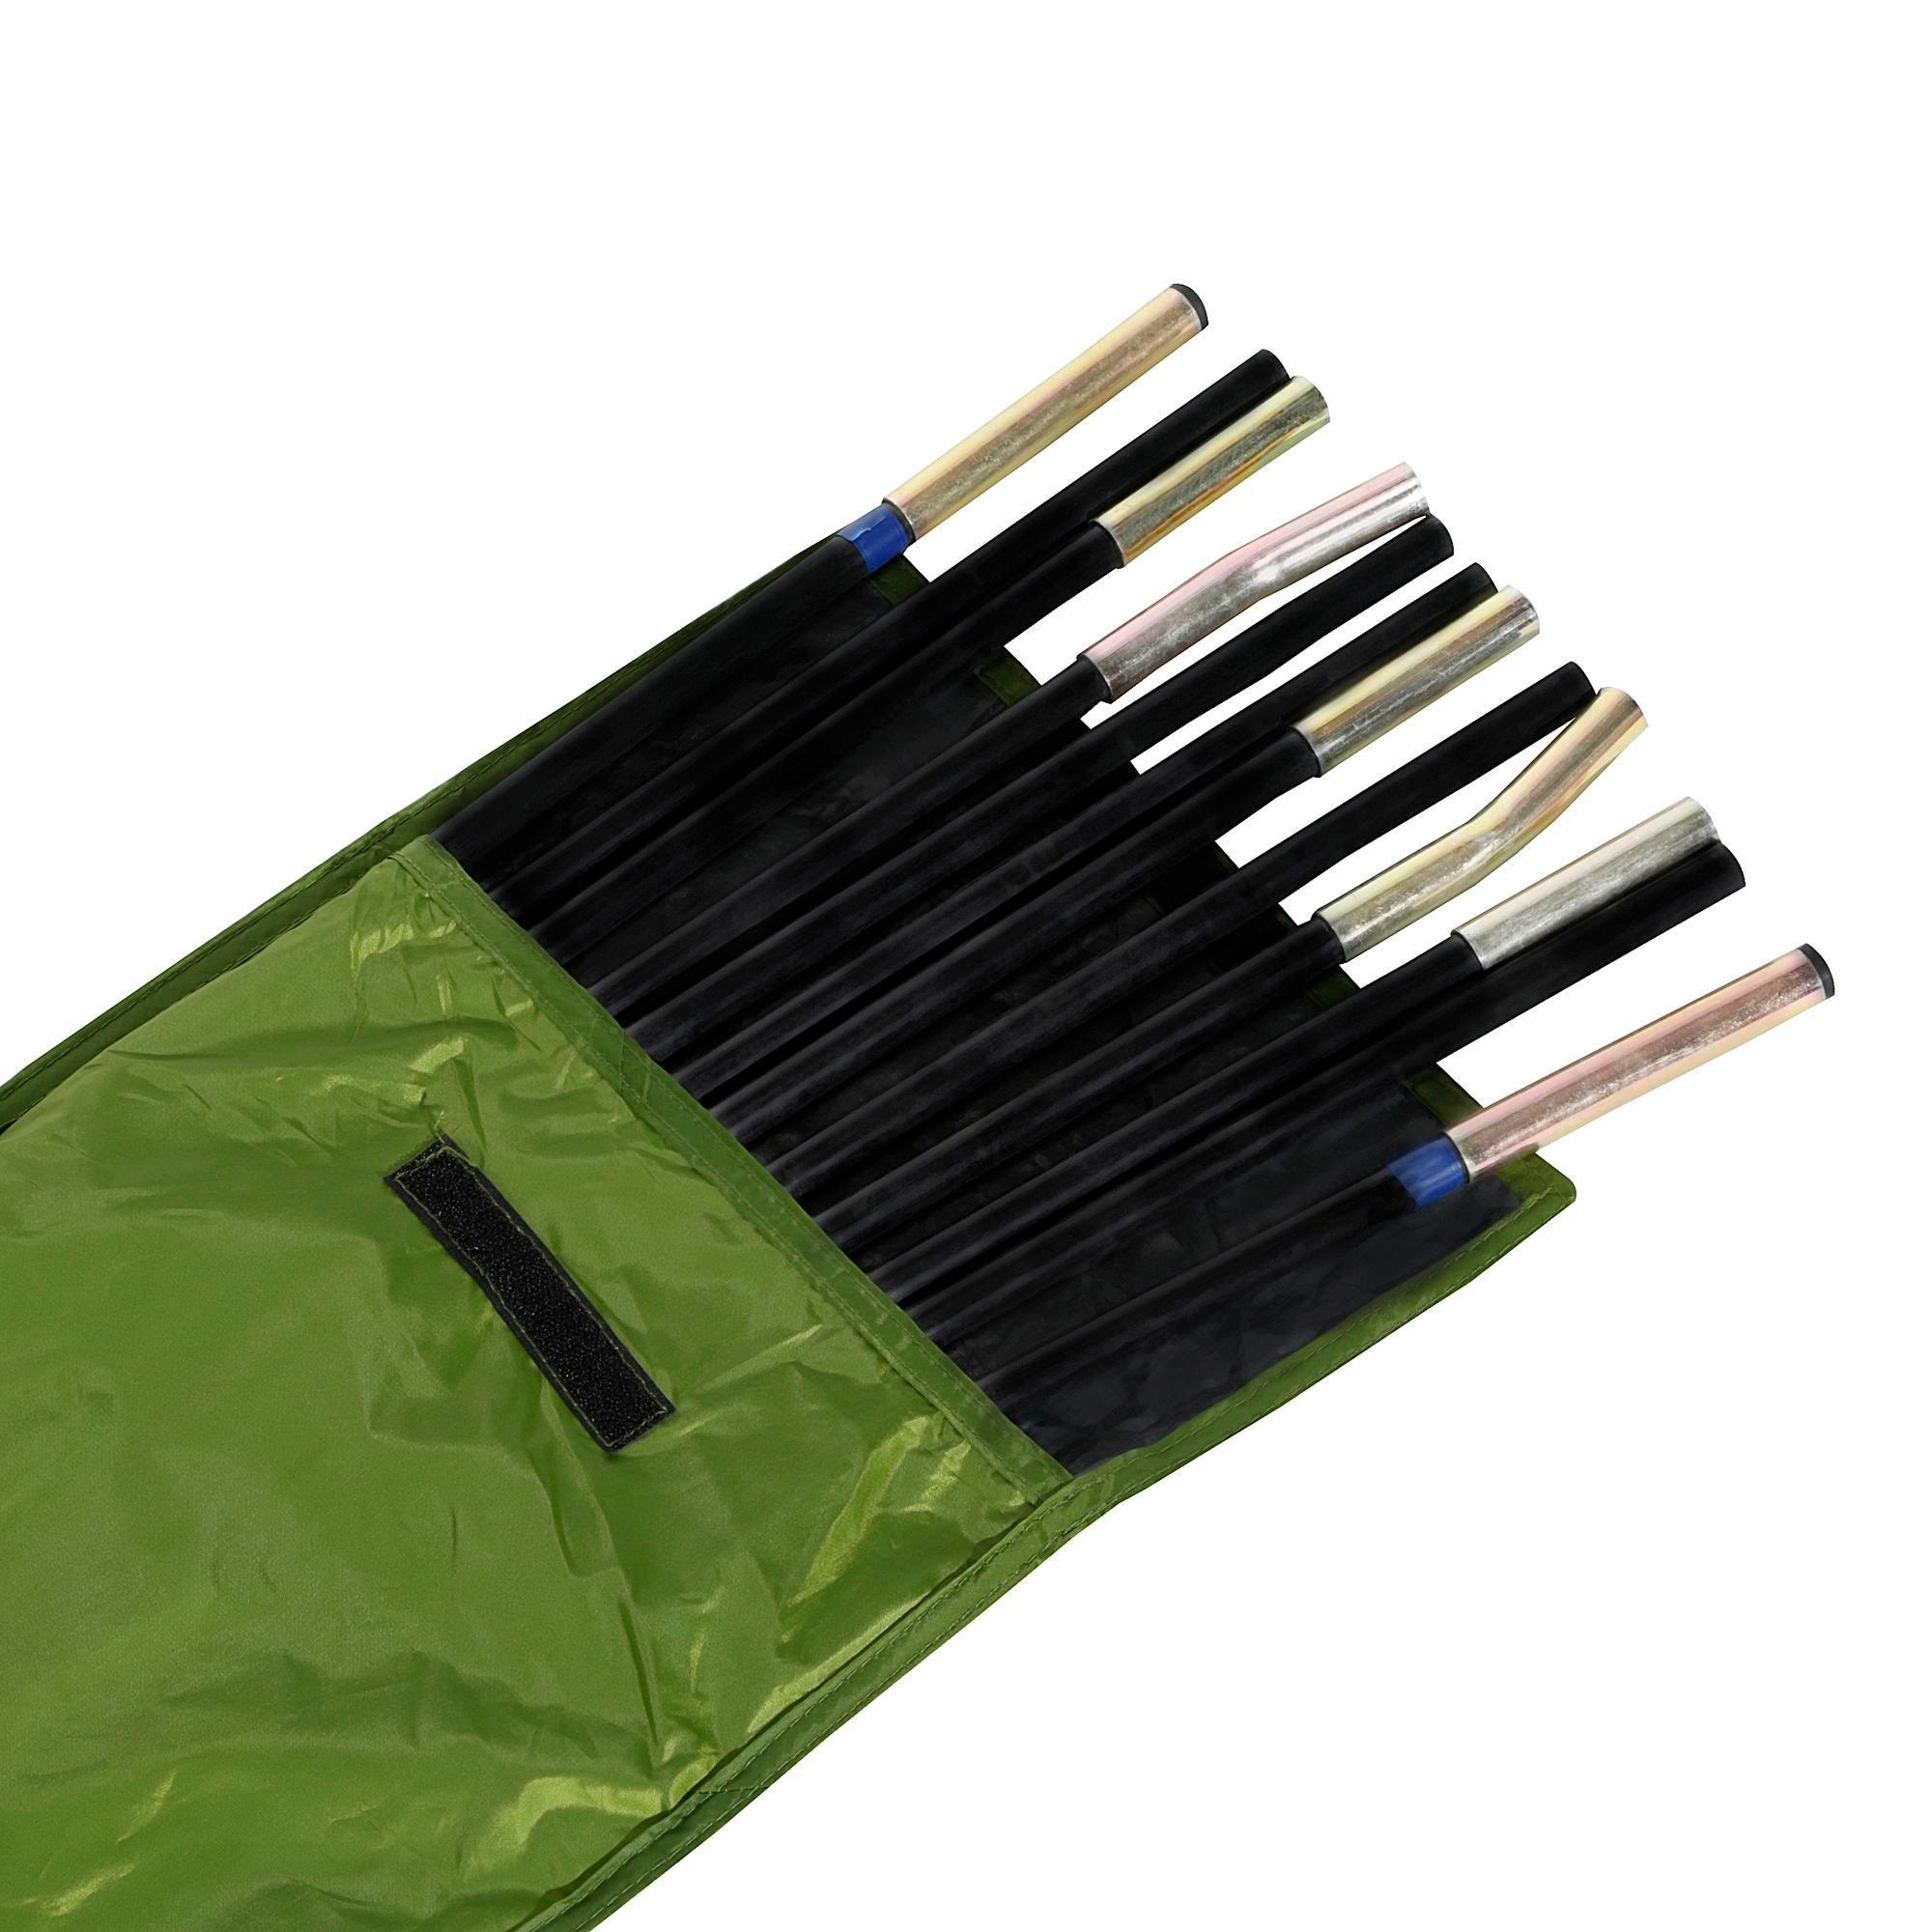 Zeltstangenset für das Zelt Arpenaz Family 5.2 XL | 03583783514096